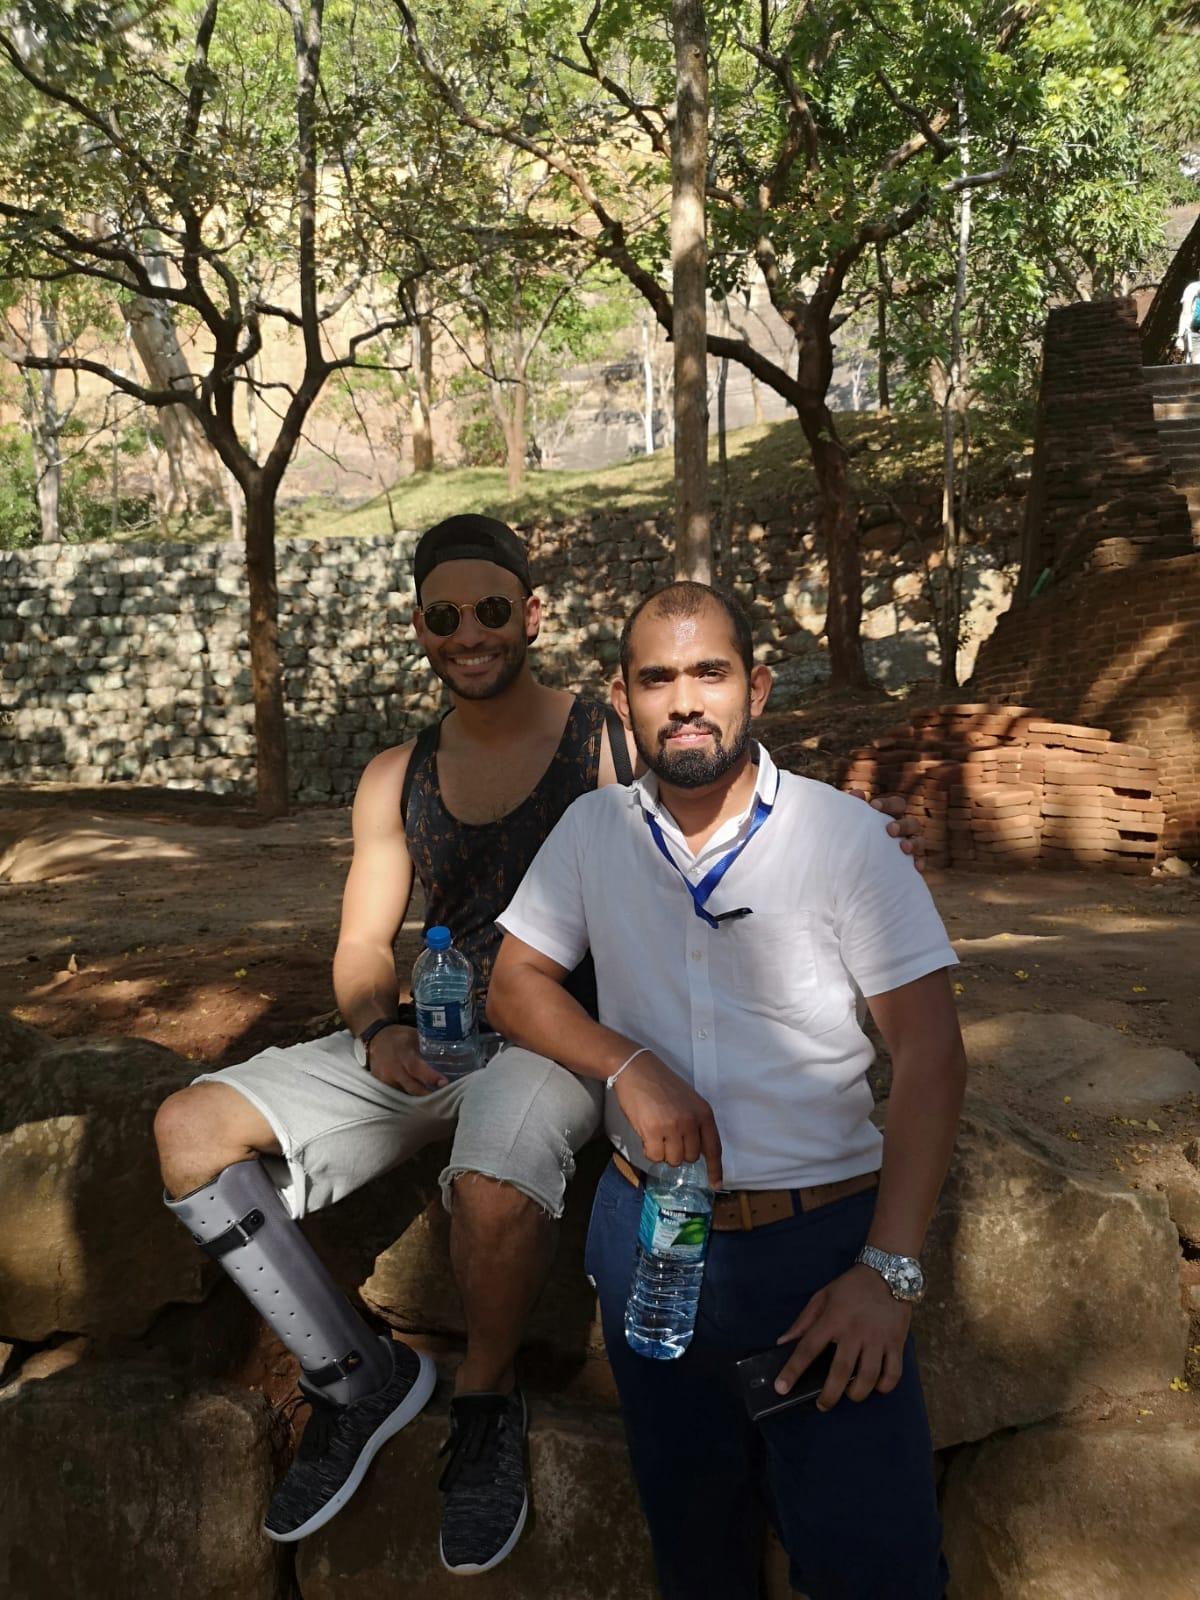 invite-to-paradise-sri-lanka-holiday-honeymoon-specialists-customer-feedback-elin-jordan-luce-ruchira-1.JPG